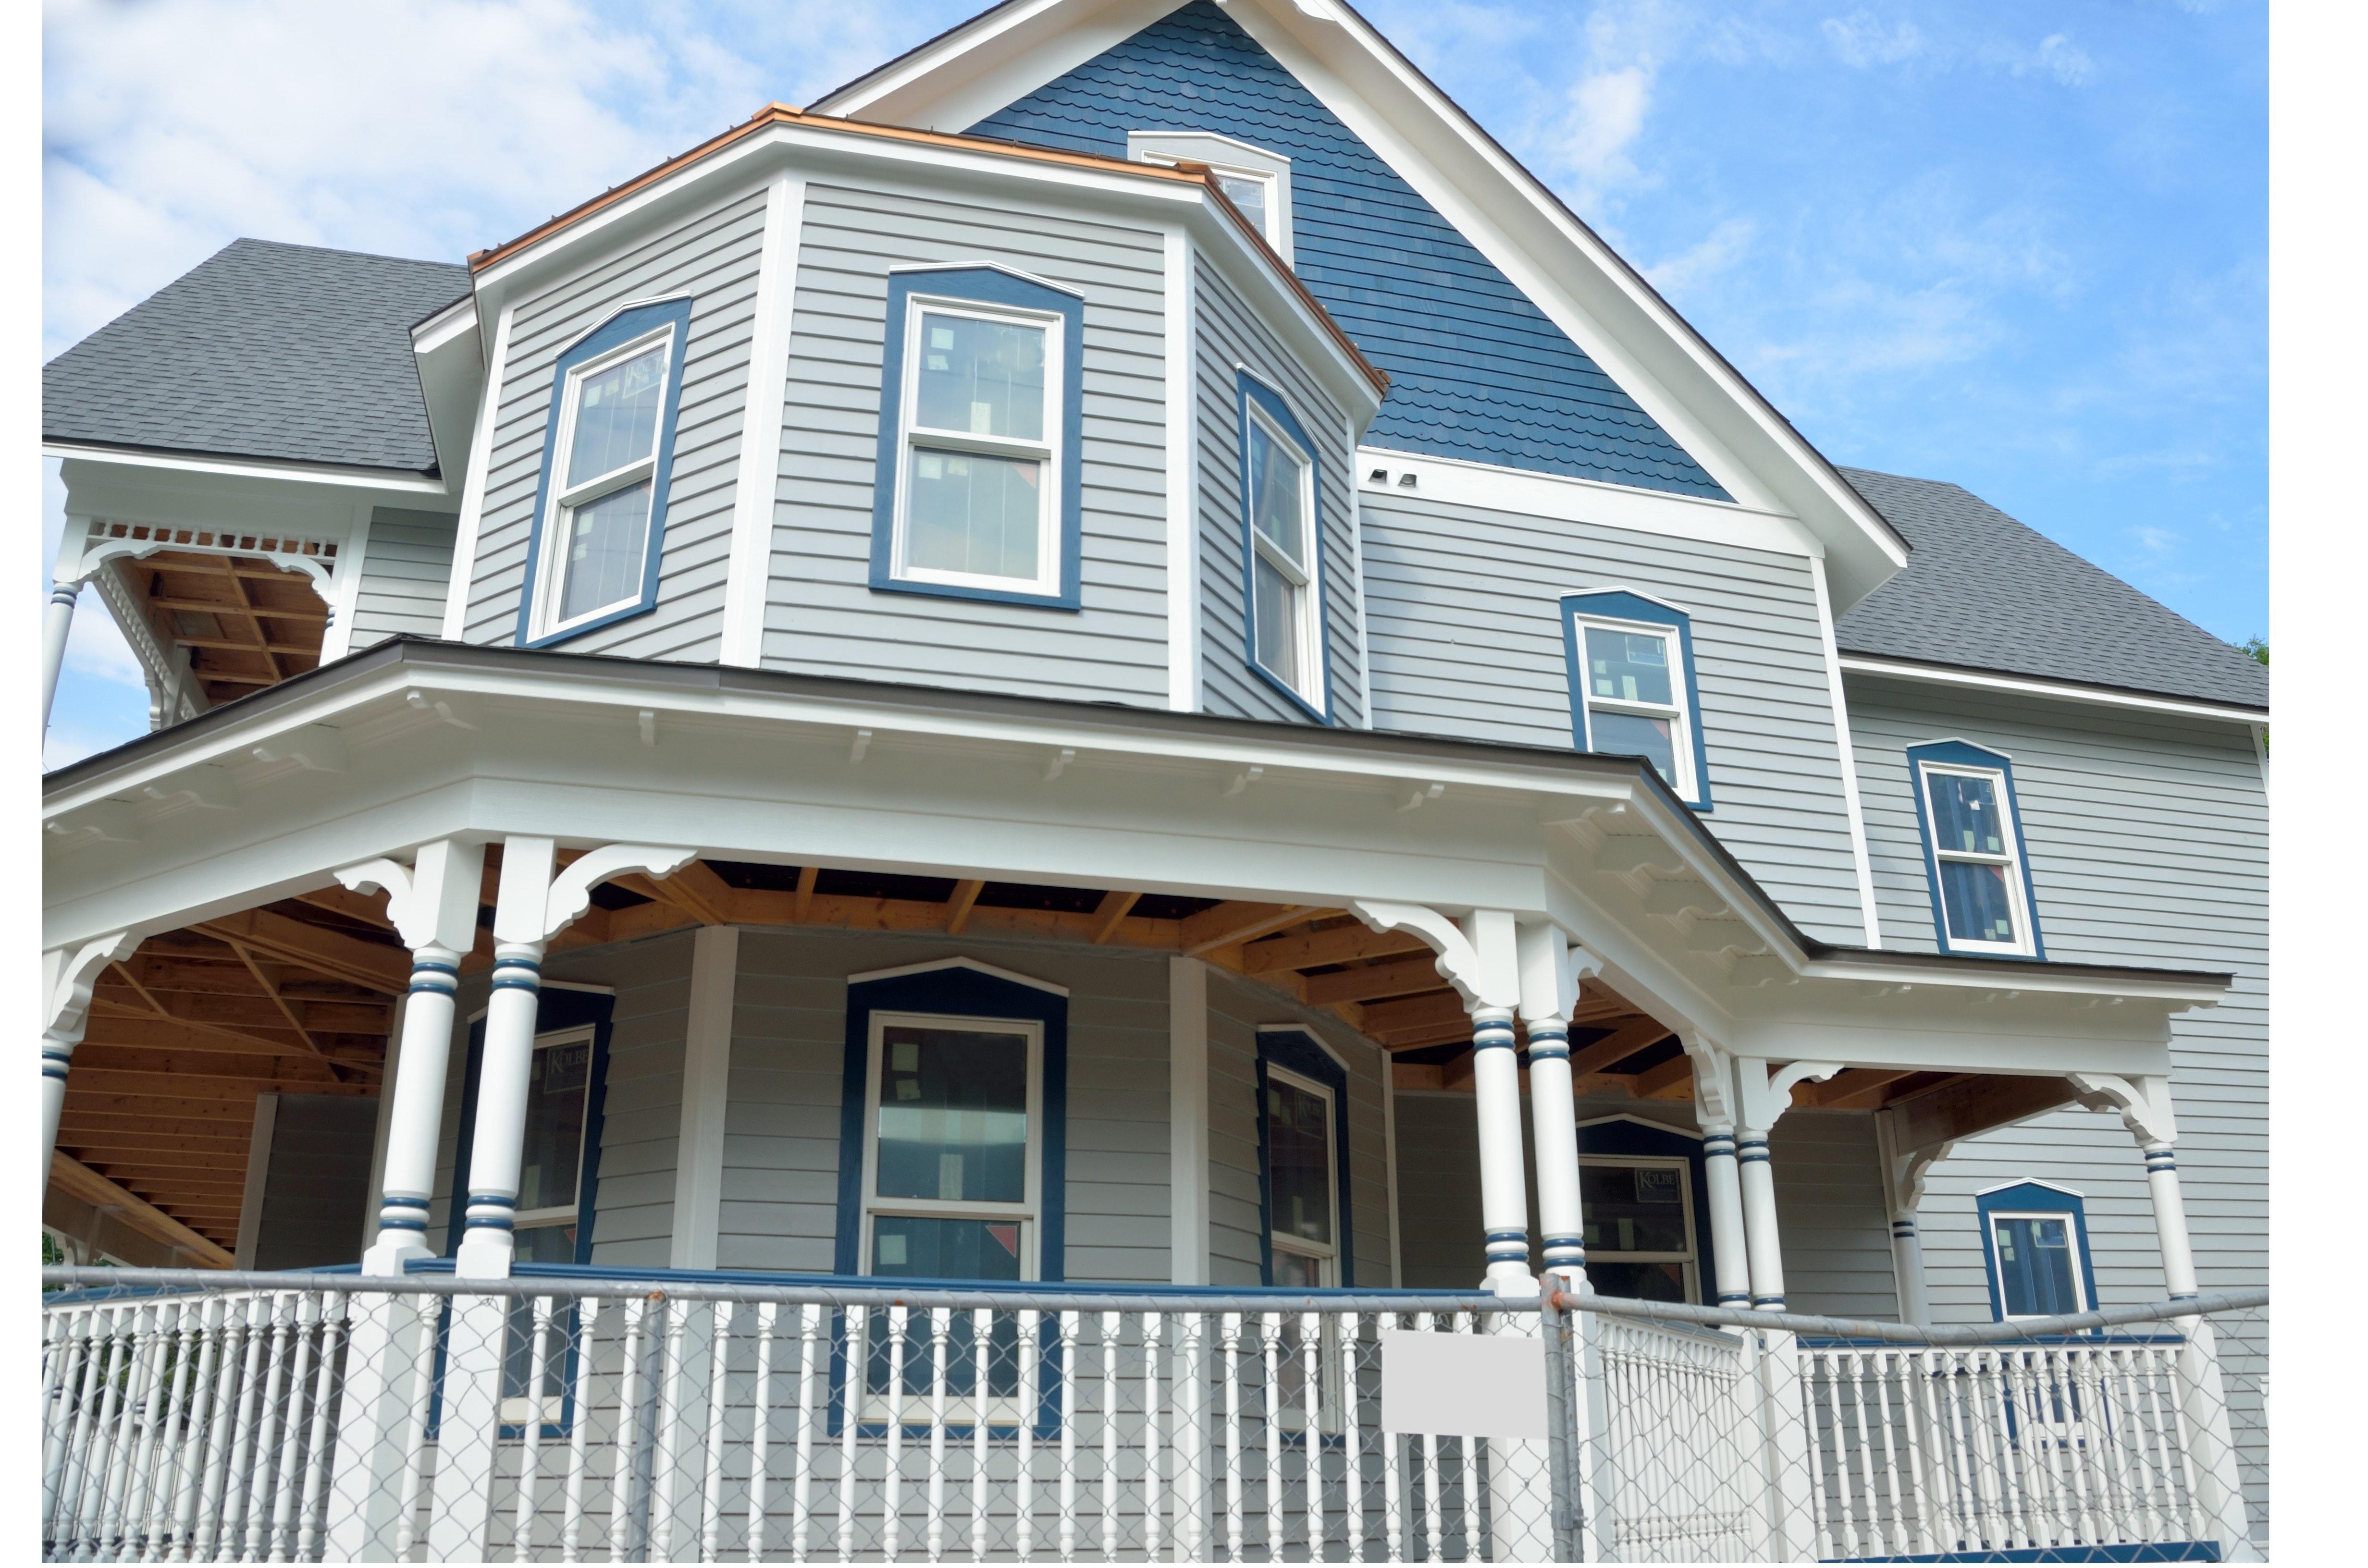 architecture-balcony-building-158730